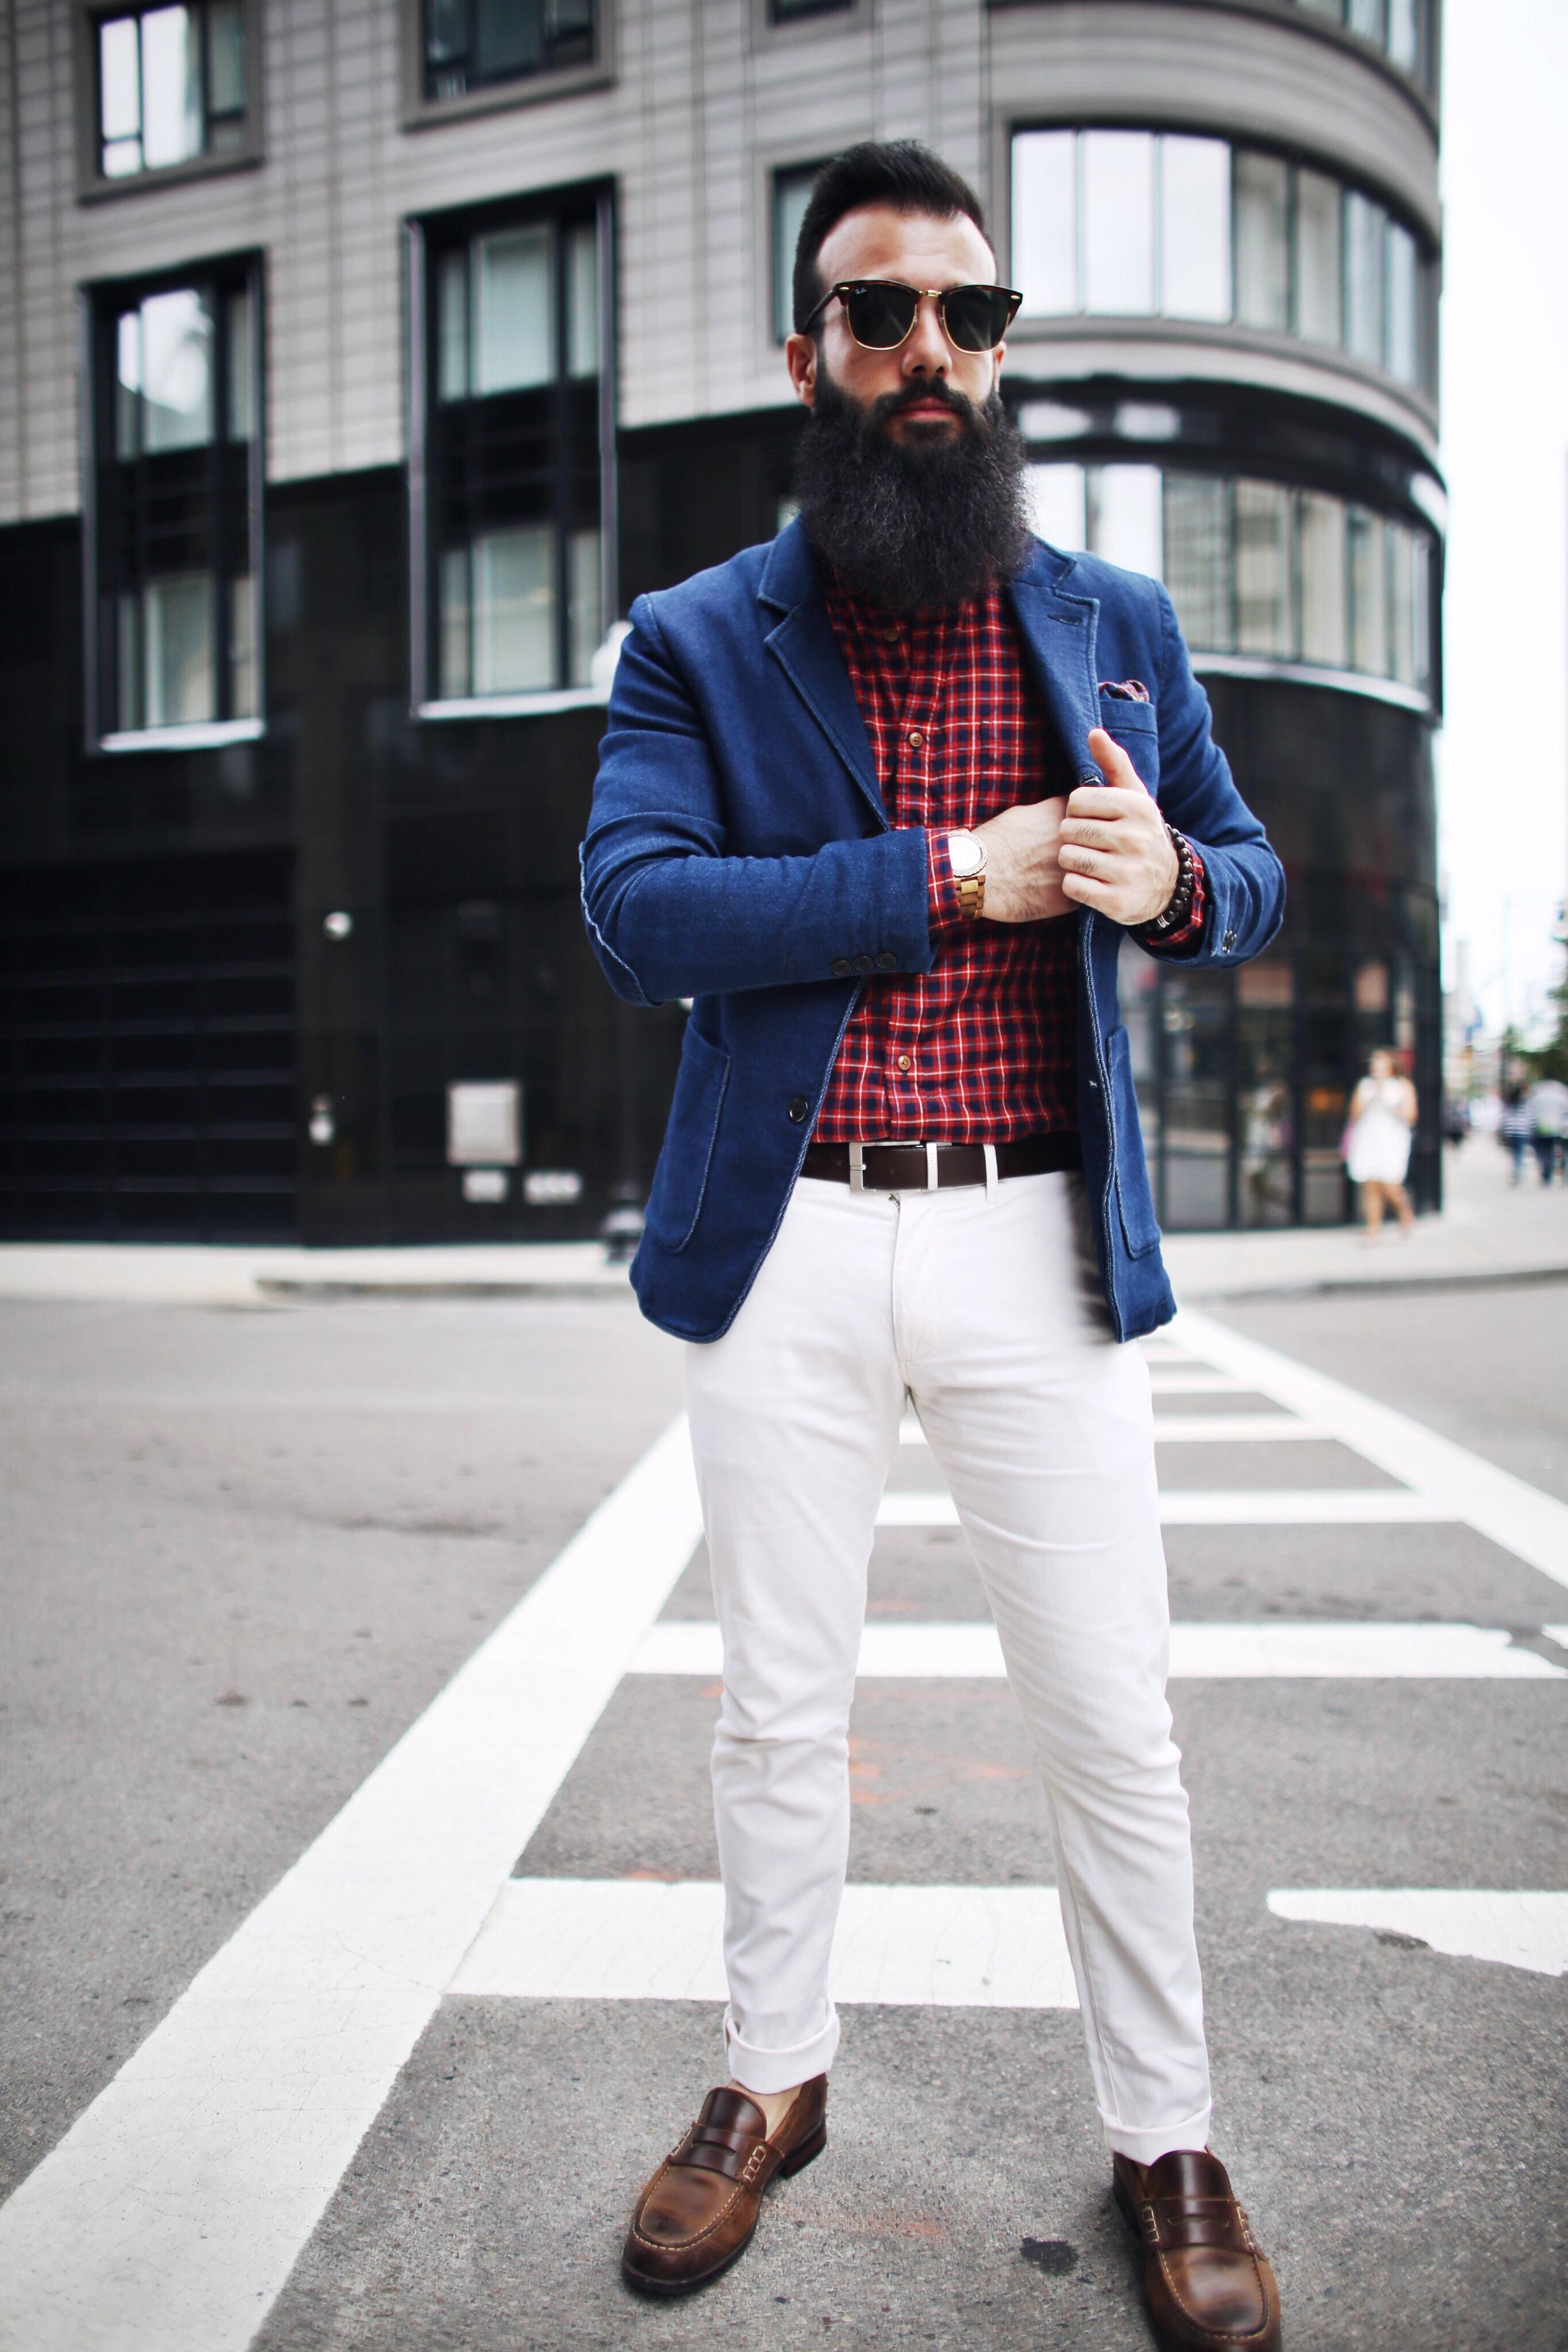 Jord with a fall outfit. Photo: Regan Cleminson, @venturetravelist